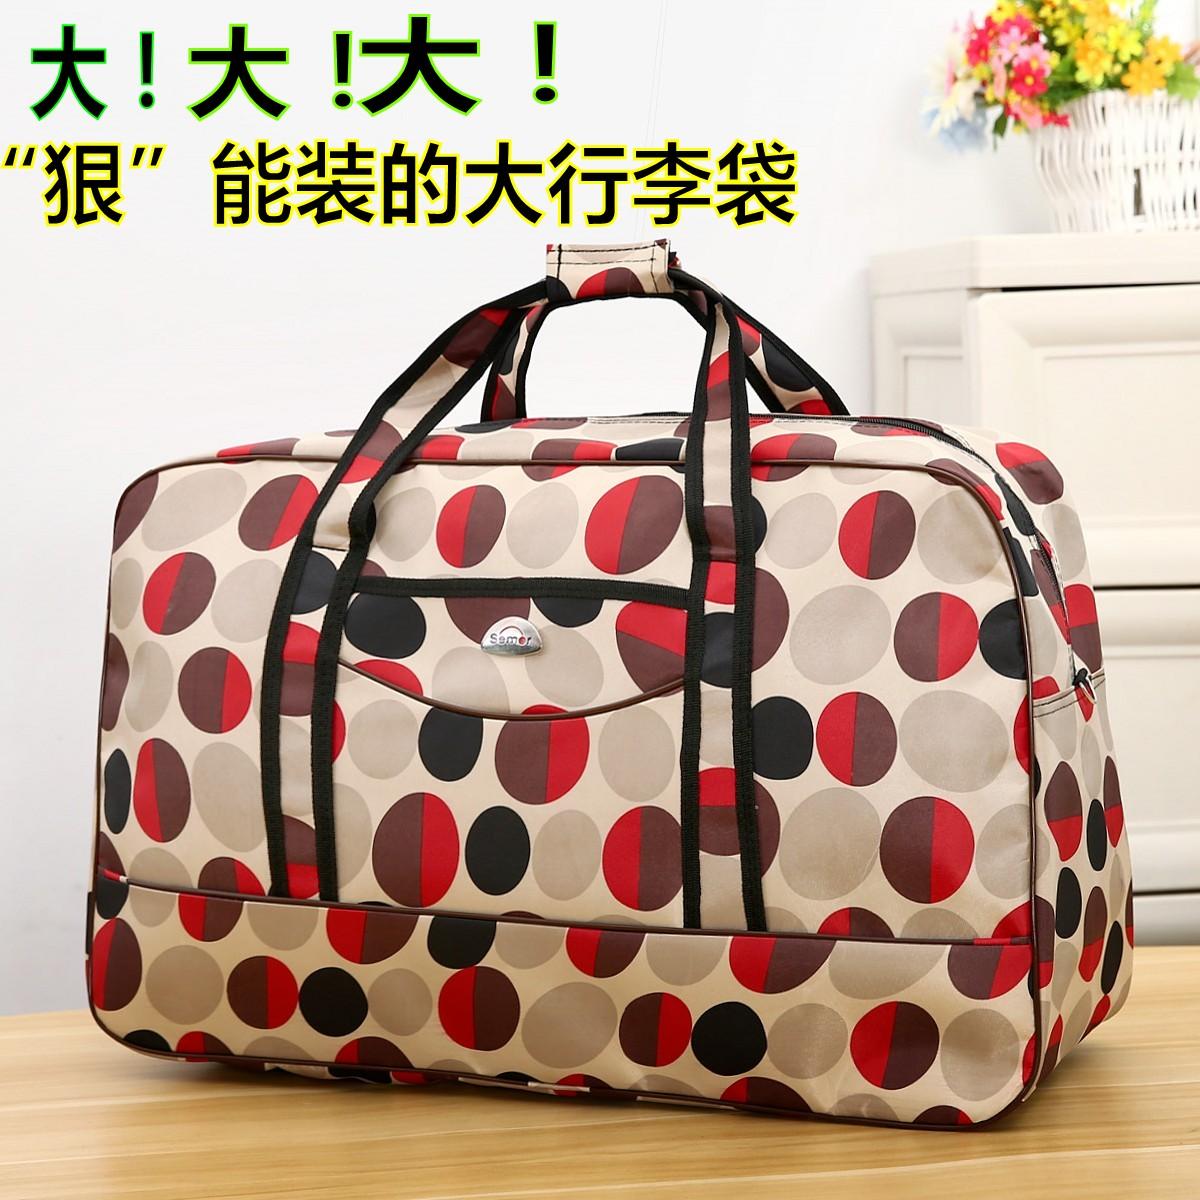 Large-capacity baggage, baggage, handbag, receipt bag, waterproof moving bag, air consignment bag, waiting bag